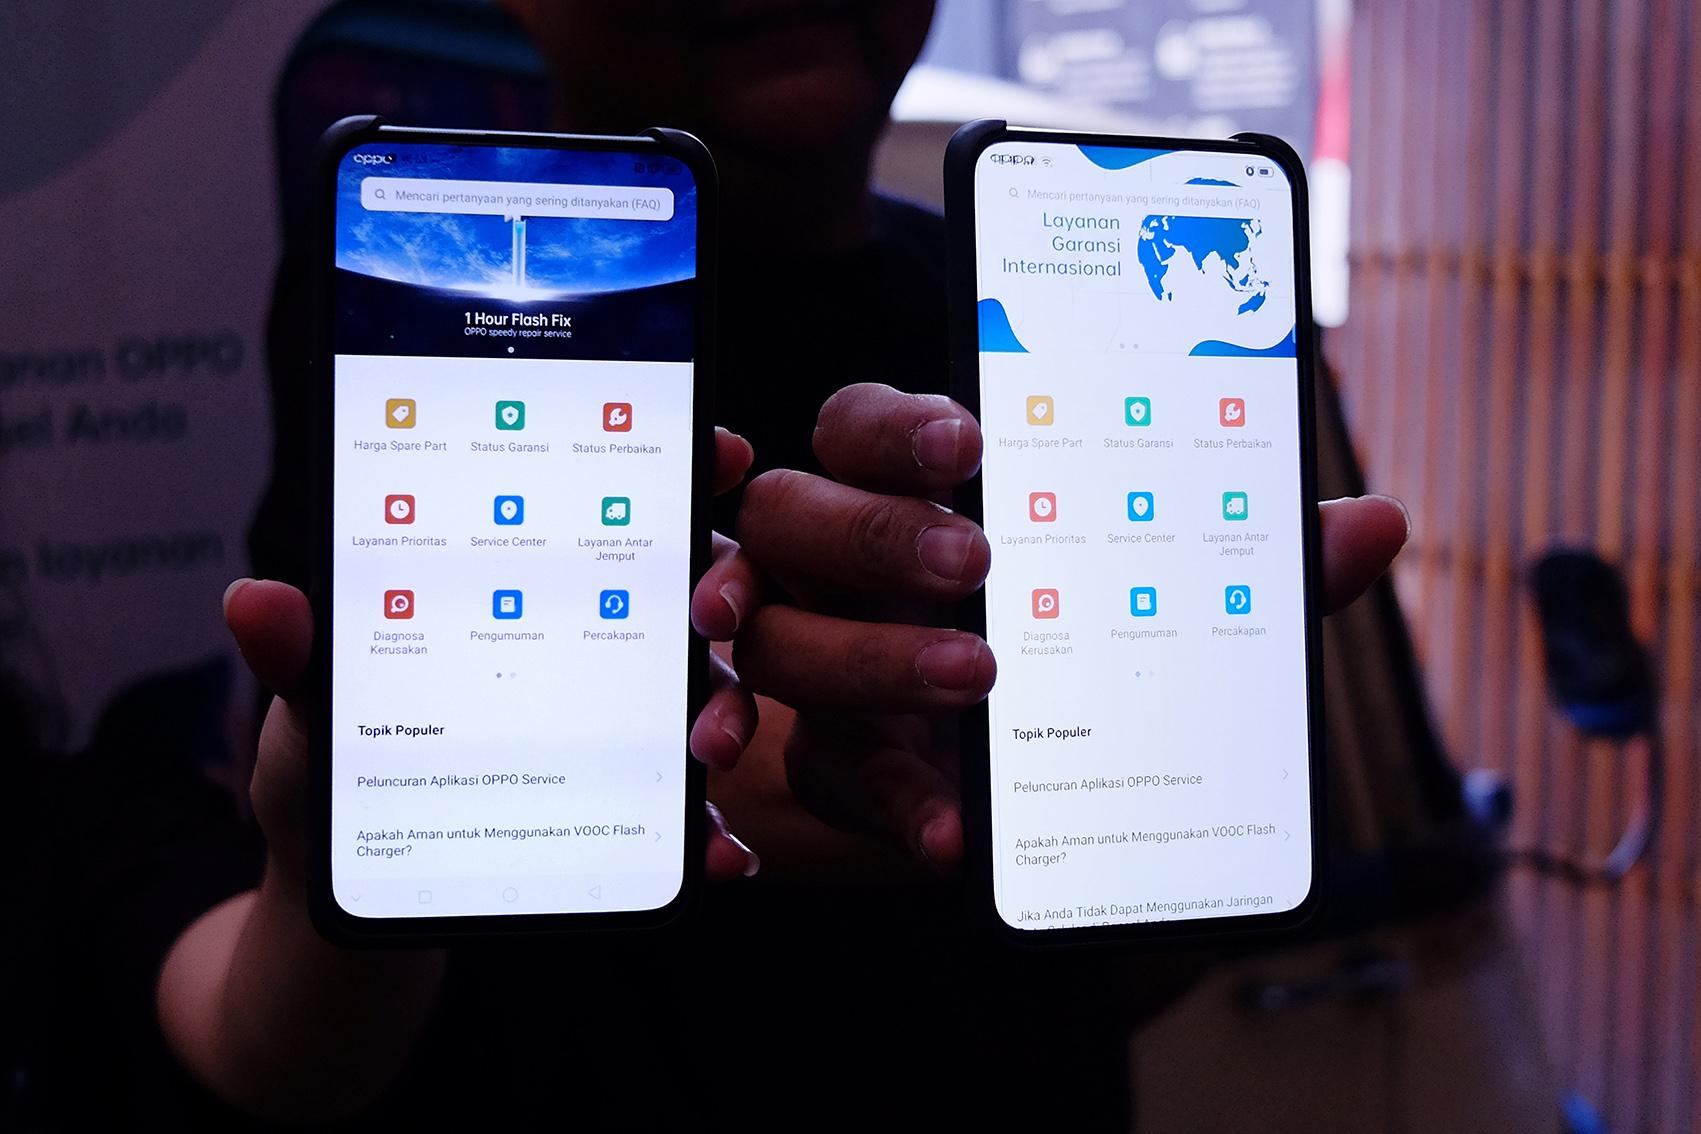 Oppo Luncurkan Aplikasi Oppo Service Trendtech Indonesia